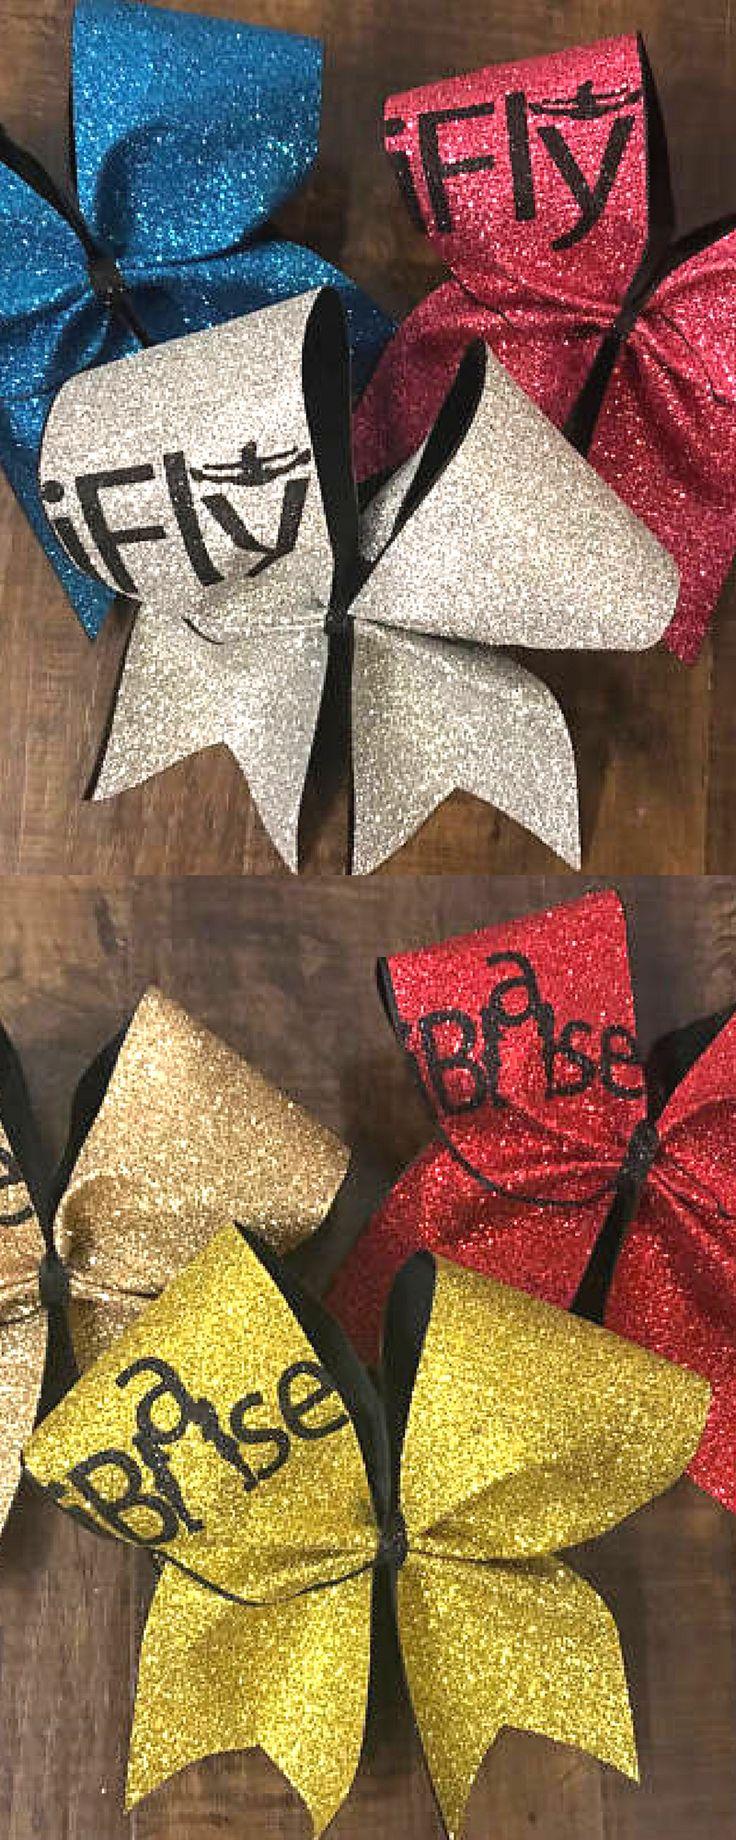 I base cheer bow - stunt base - base cheer bow - cheer bow - stunt bow - stunting - custom cheer bow - I FLY cheer bow, cheerleading hair accessories, glitter bows. Cheer coach. Stunt goals. #cheerleading #ad